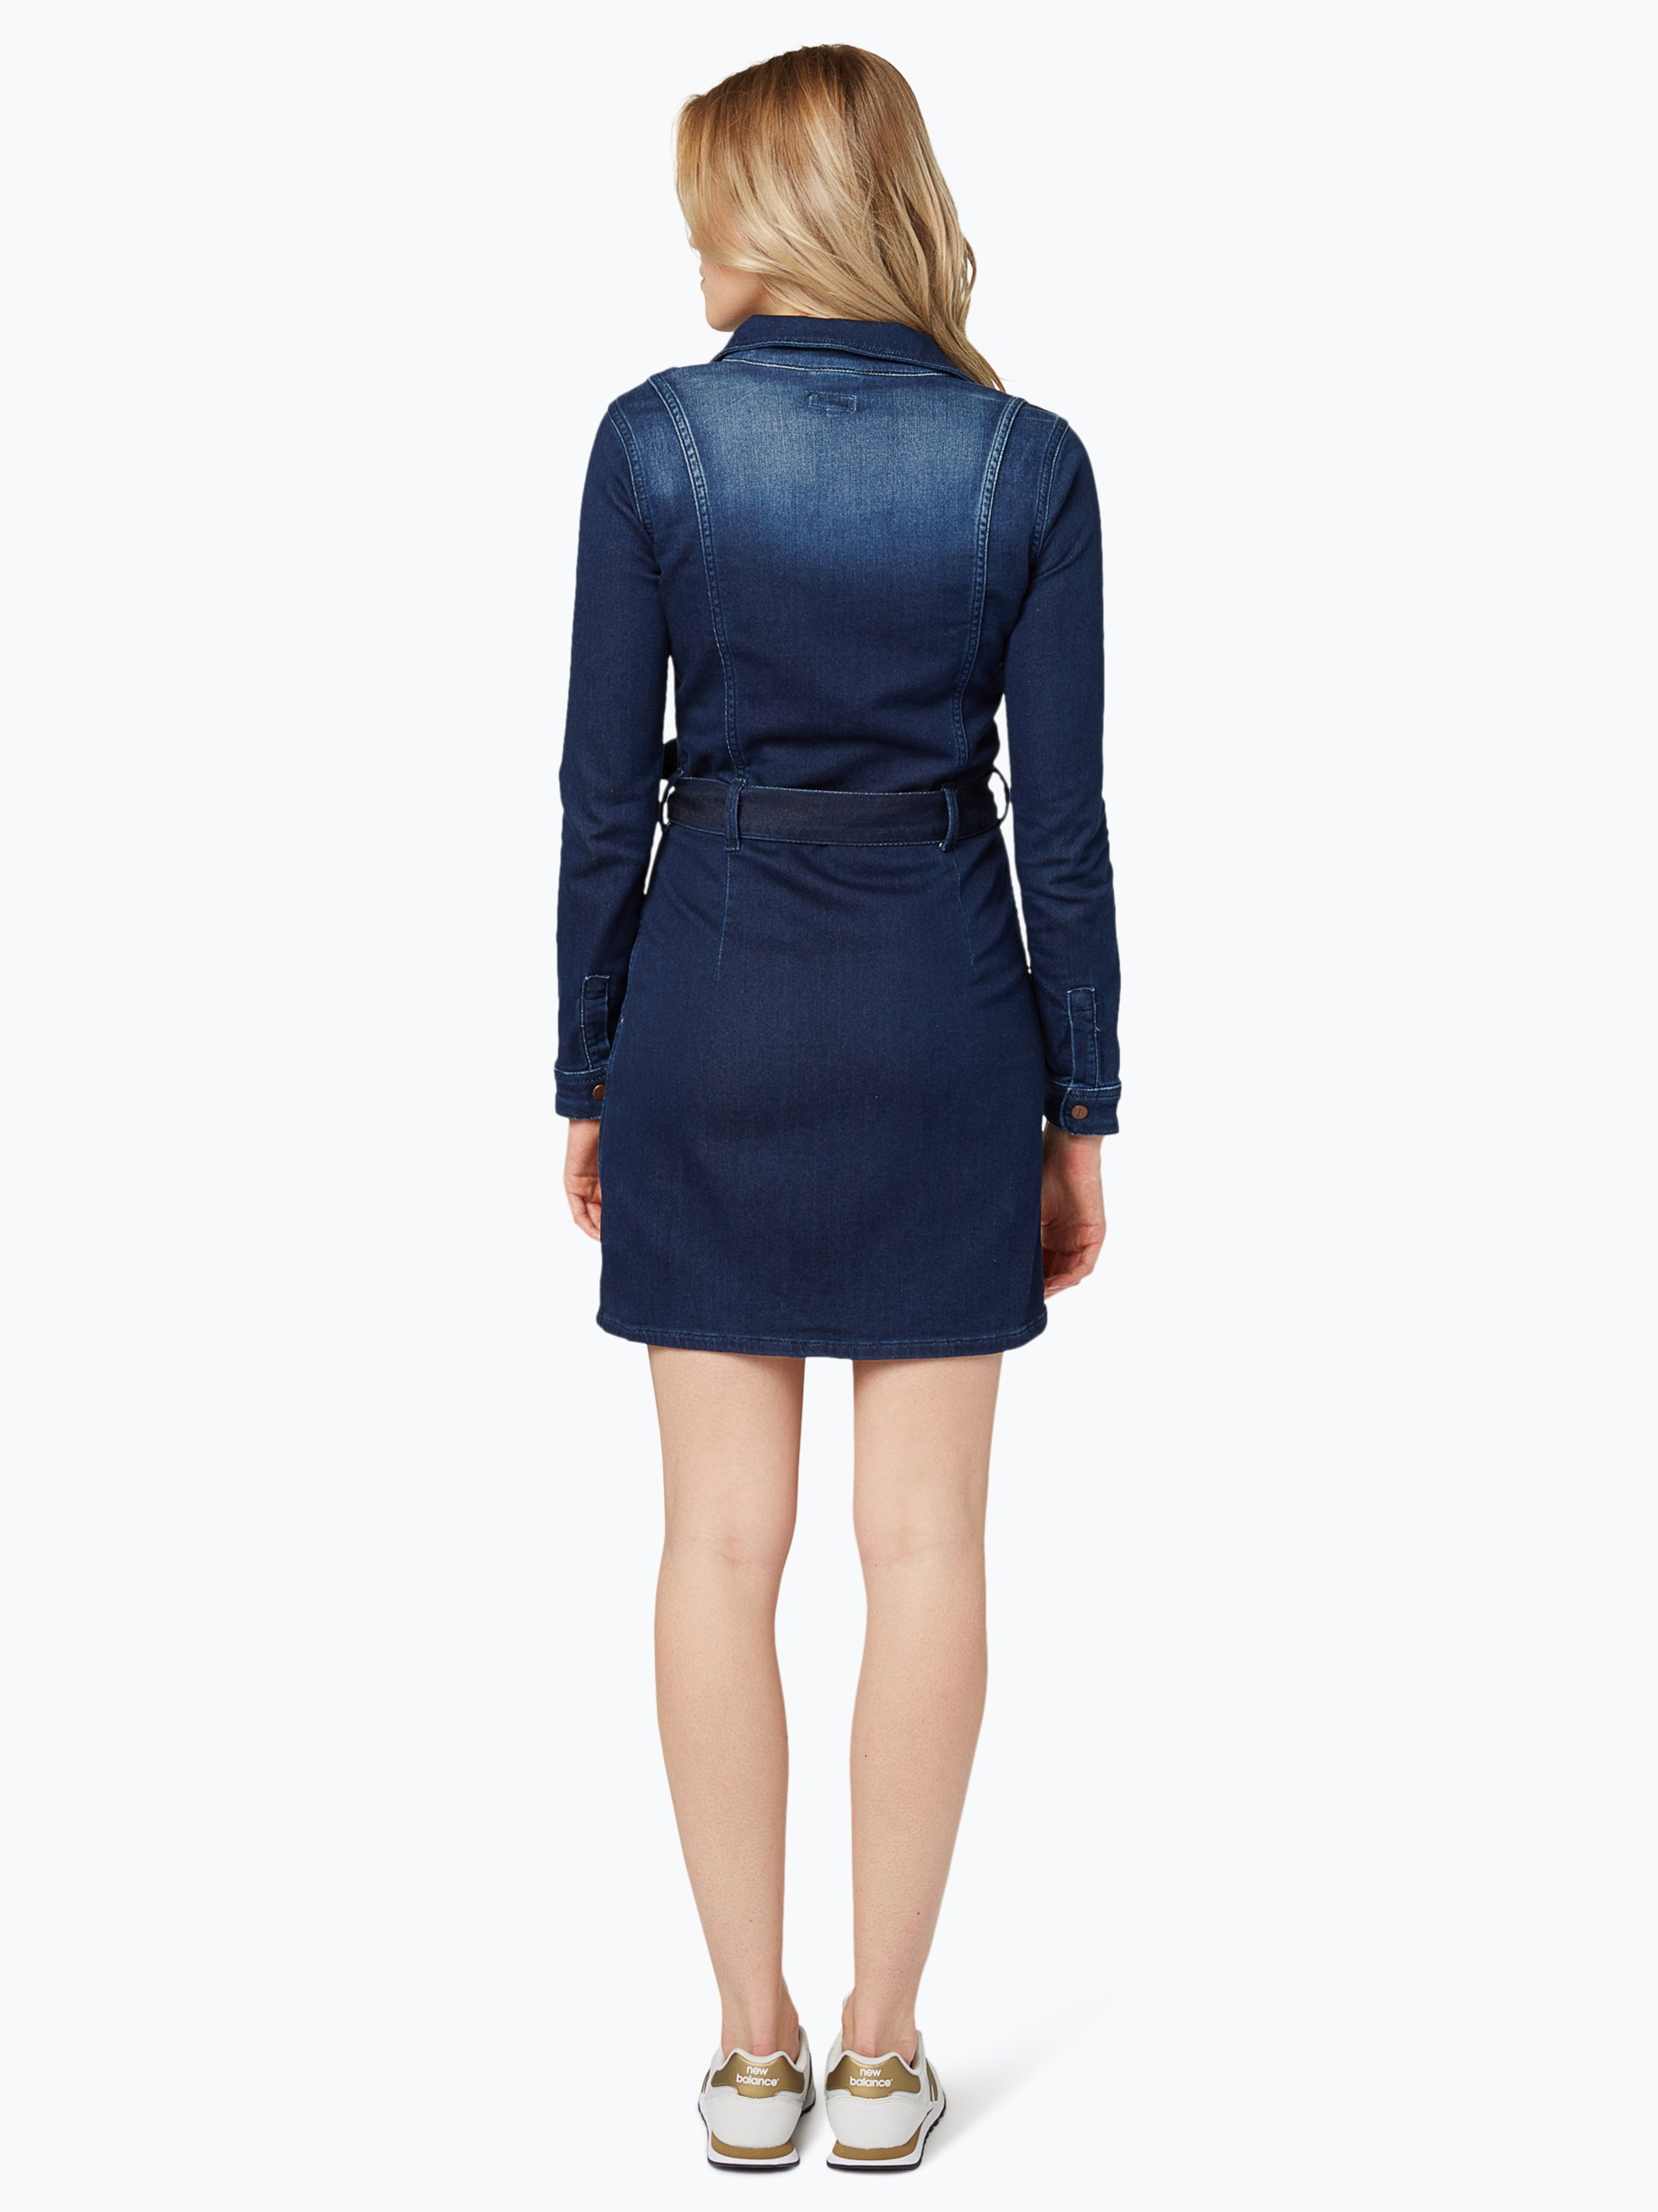 baf003c25c56 Pepe Jeans Damen Jeanskleid- Nicole online kaufen   VANGRAAF.COM